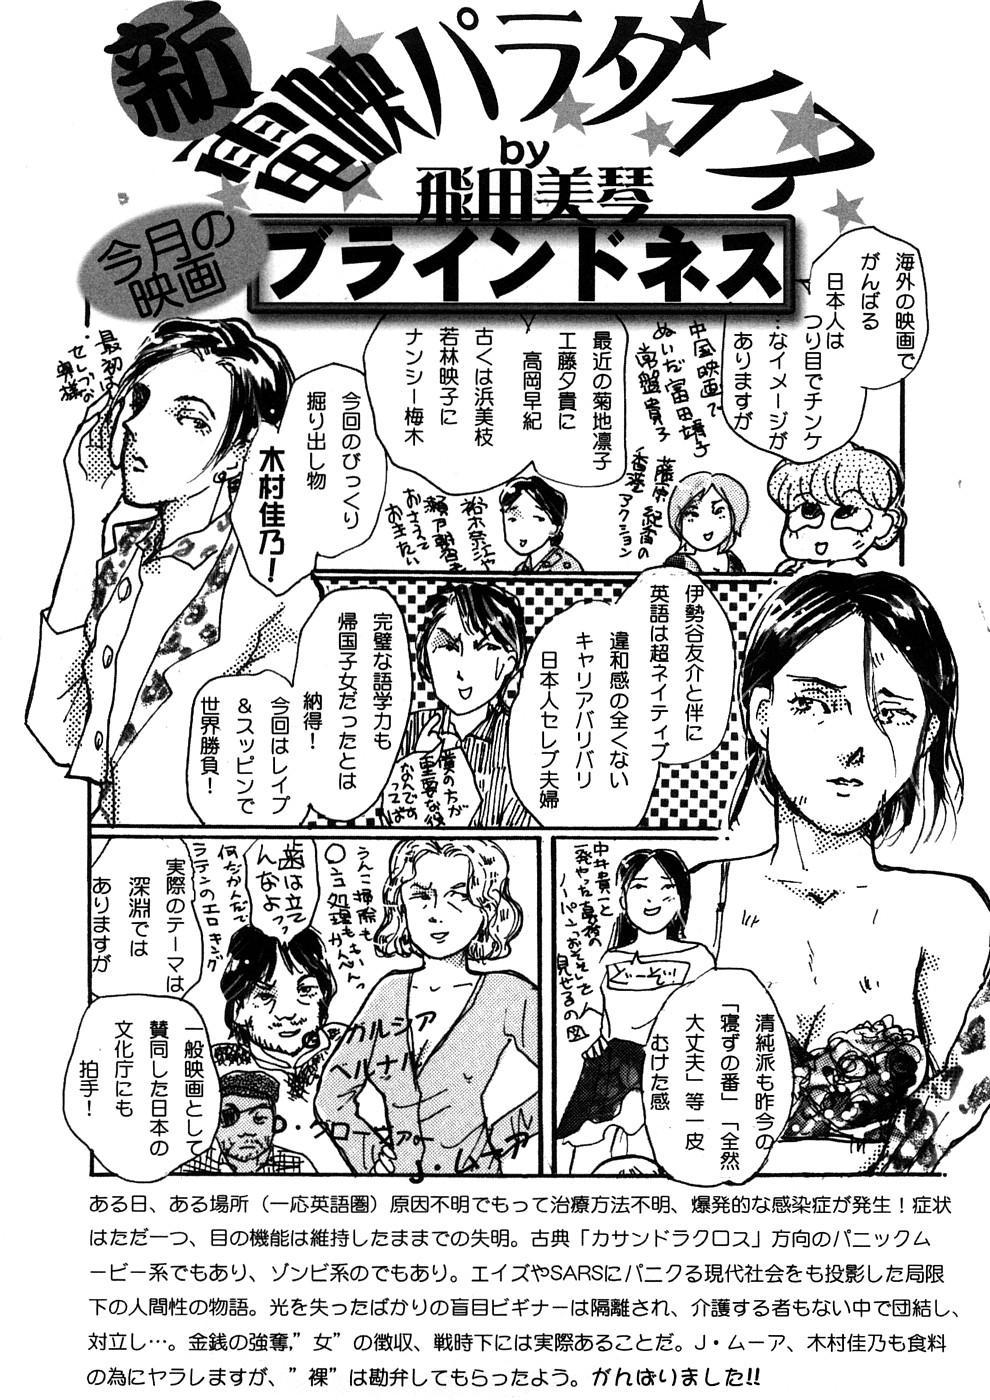 Geki Yaba Anthology Vol. 1 - Naka ni Dashite yo 242